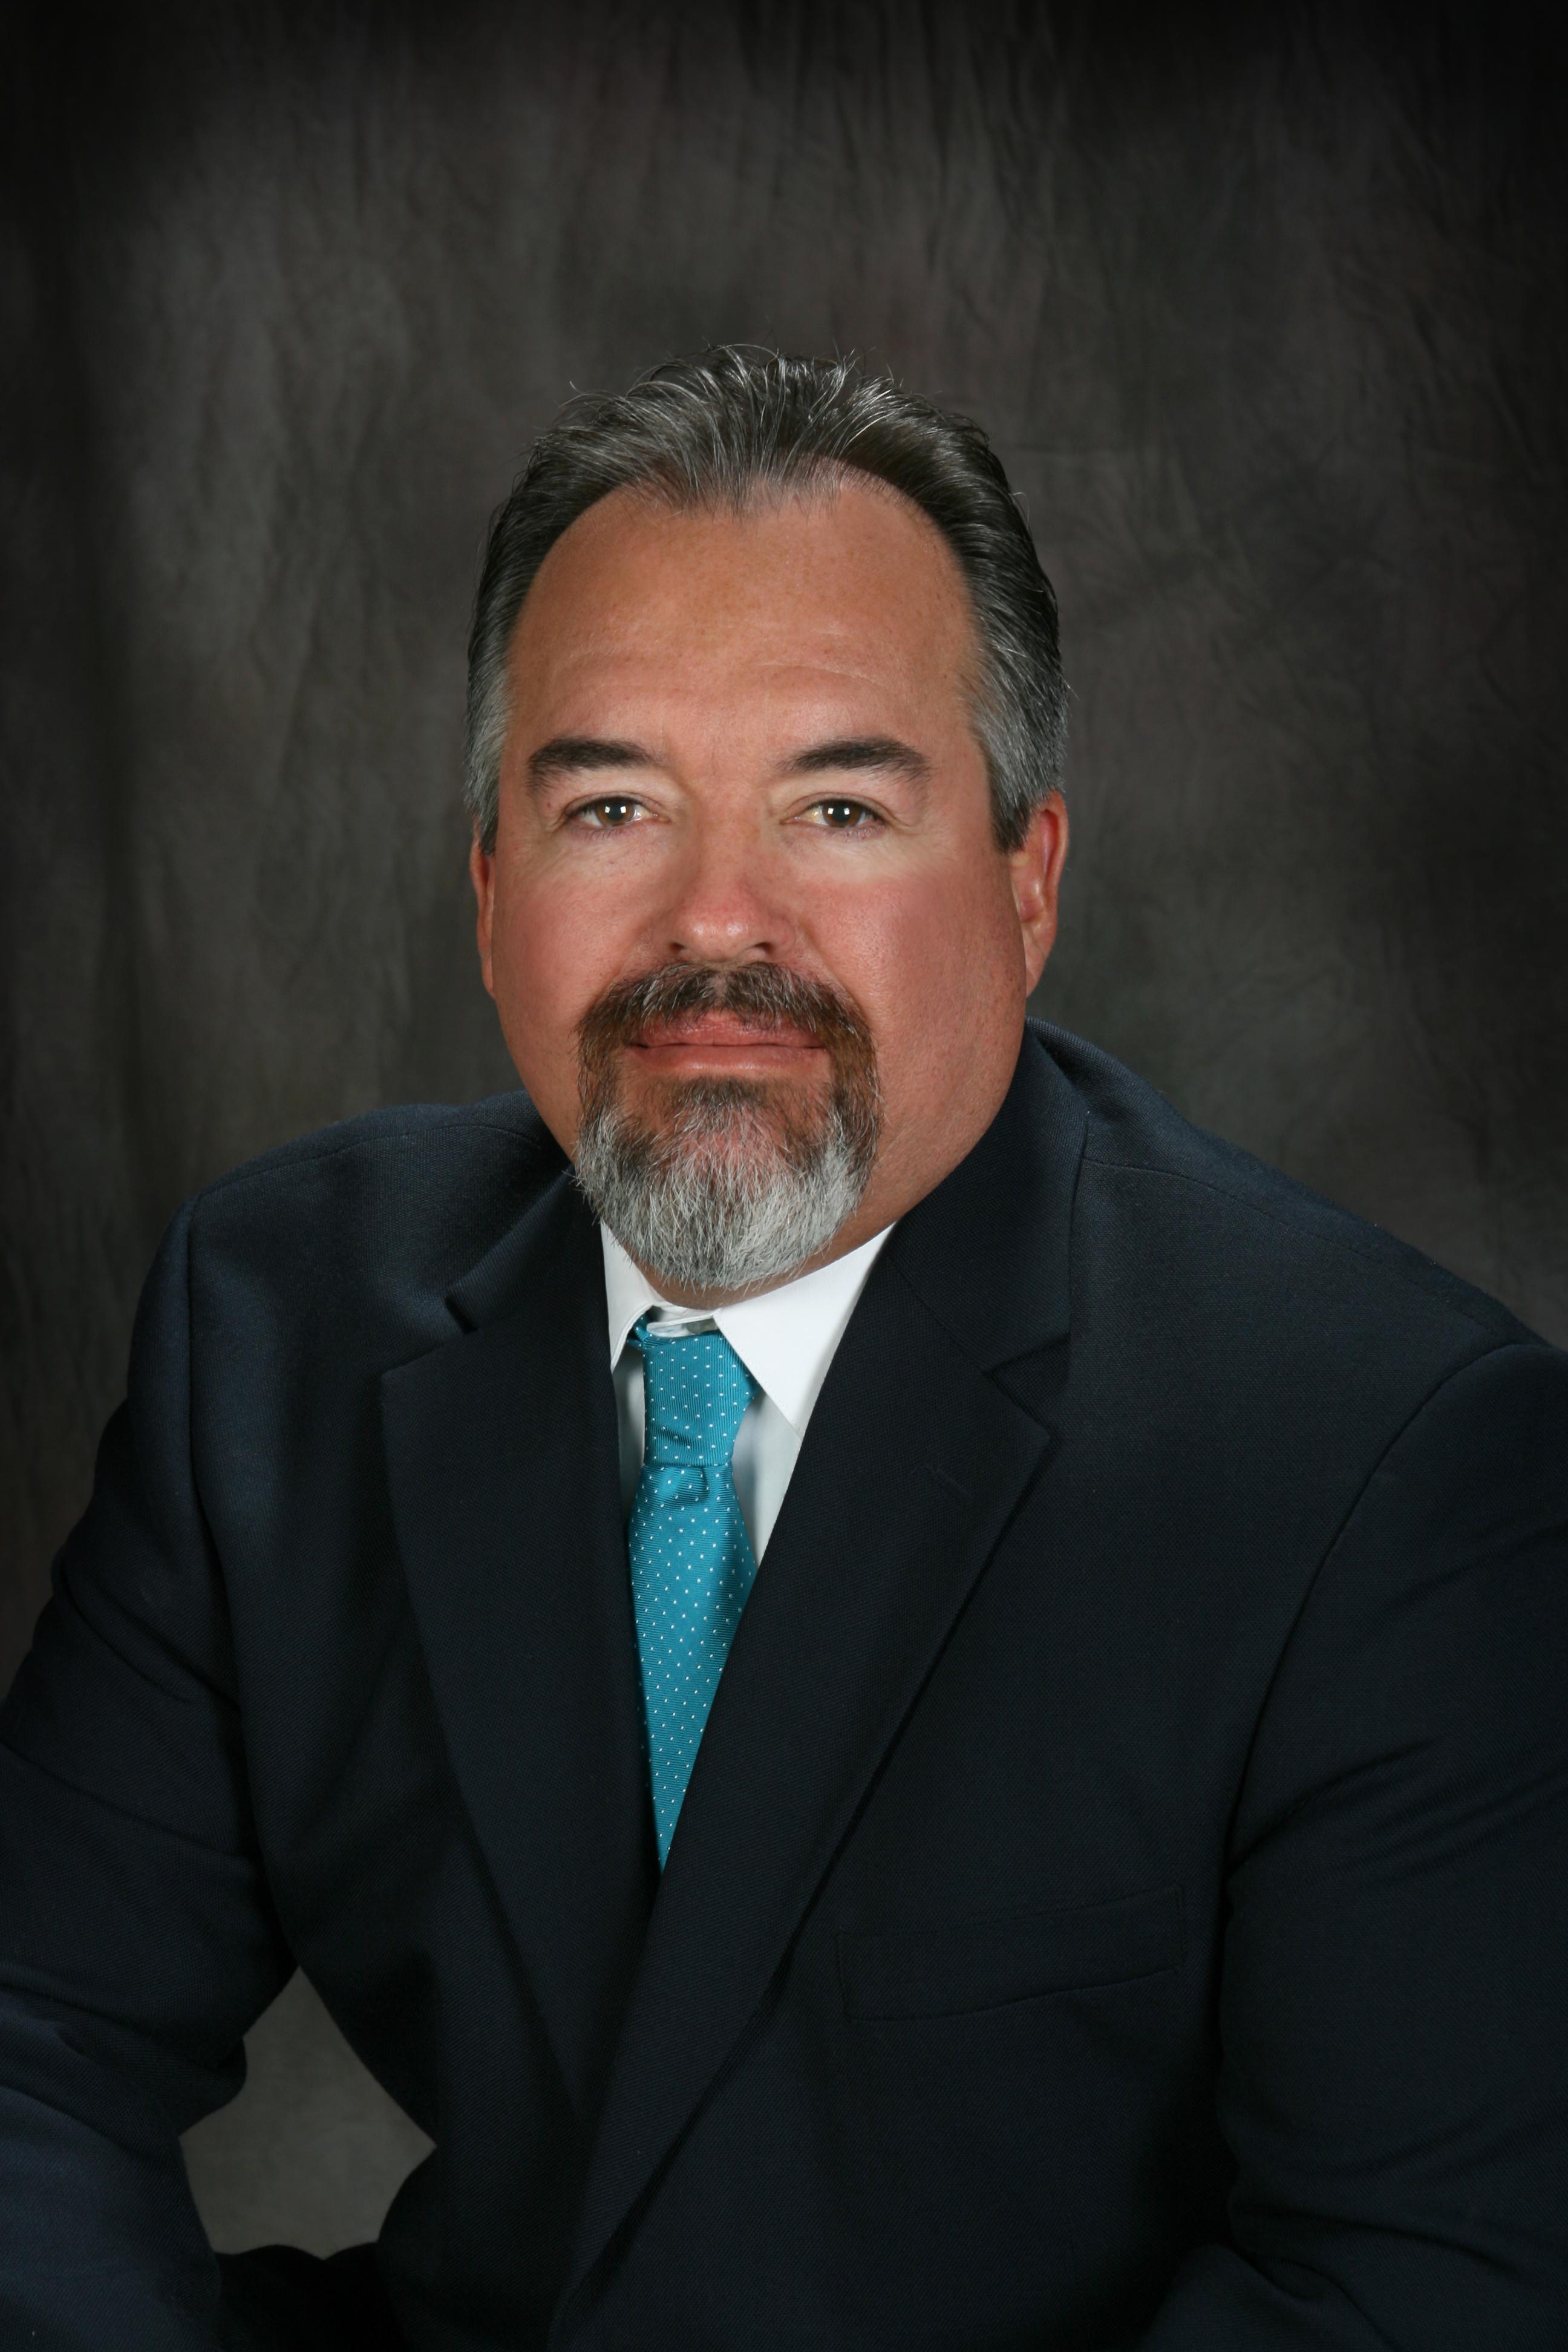 Robert C. May, Associate Broker